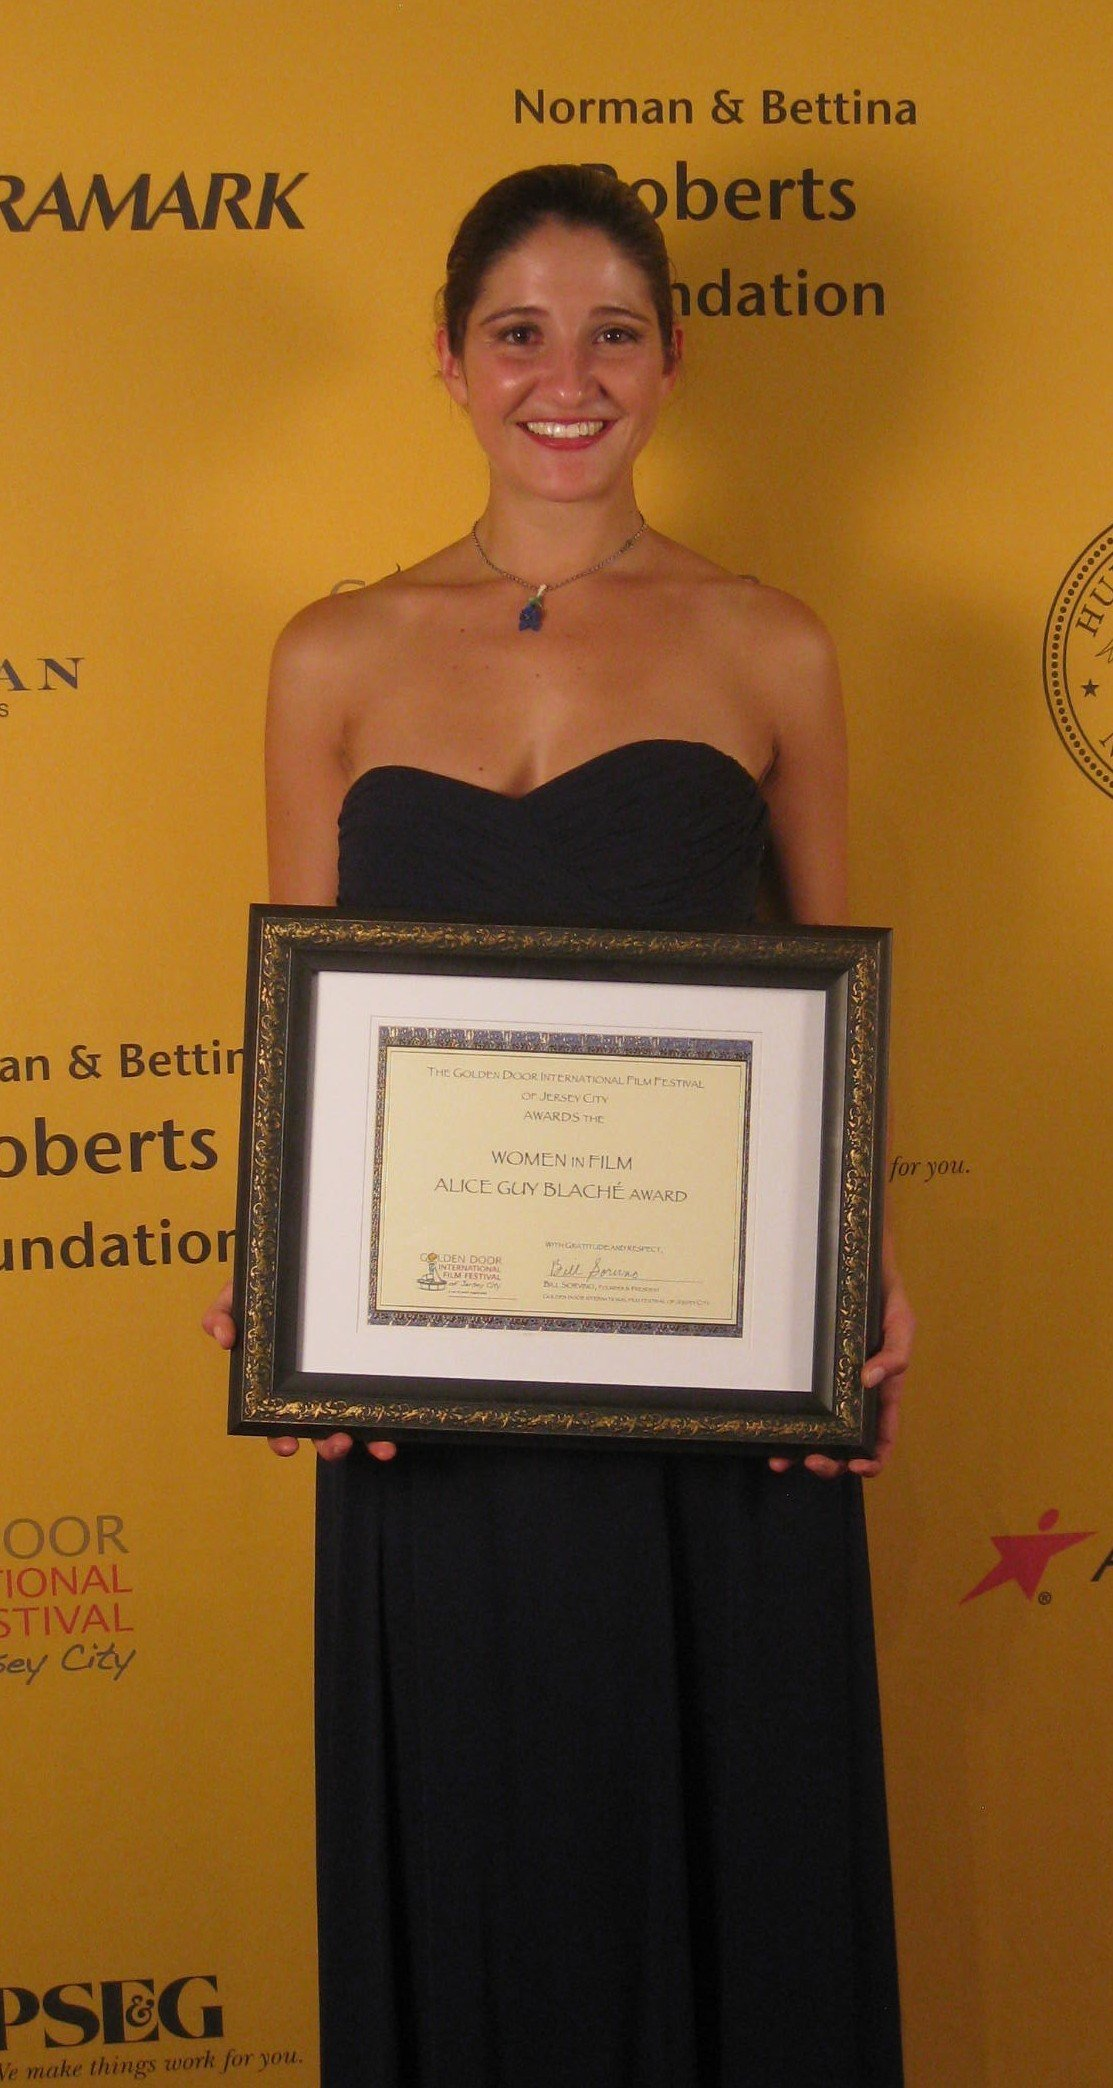 Director Laura Thies received the Alice Guy Blache Female Filmmaker Award at the 2012 Golden Door International Film Festival.